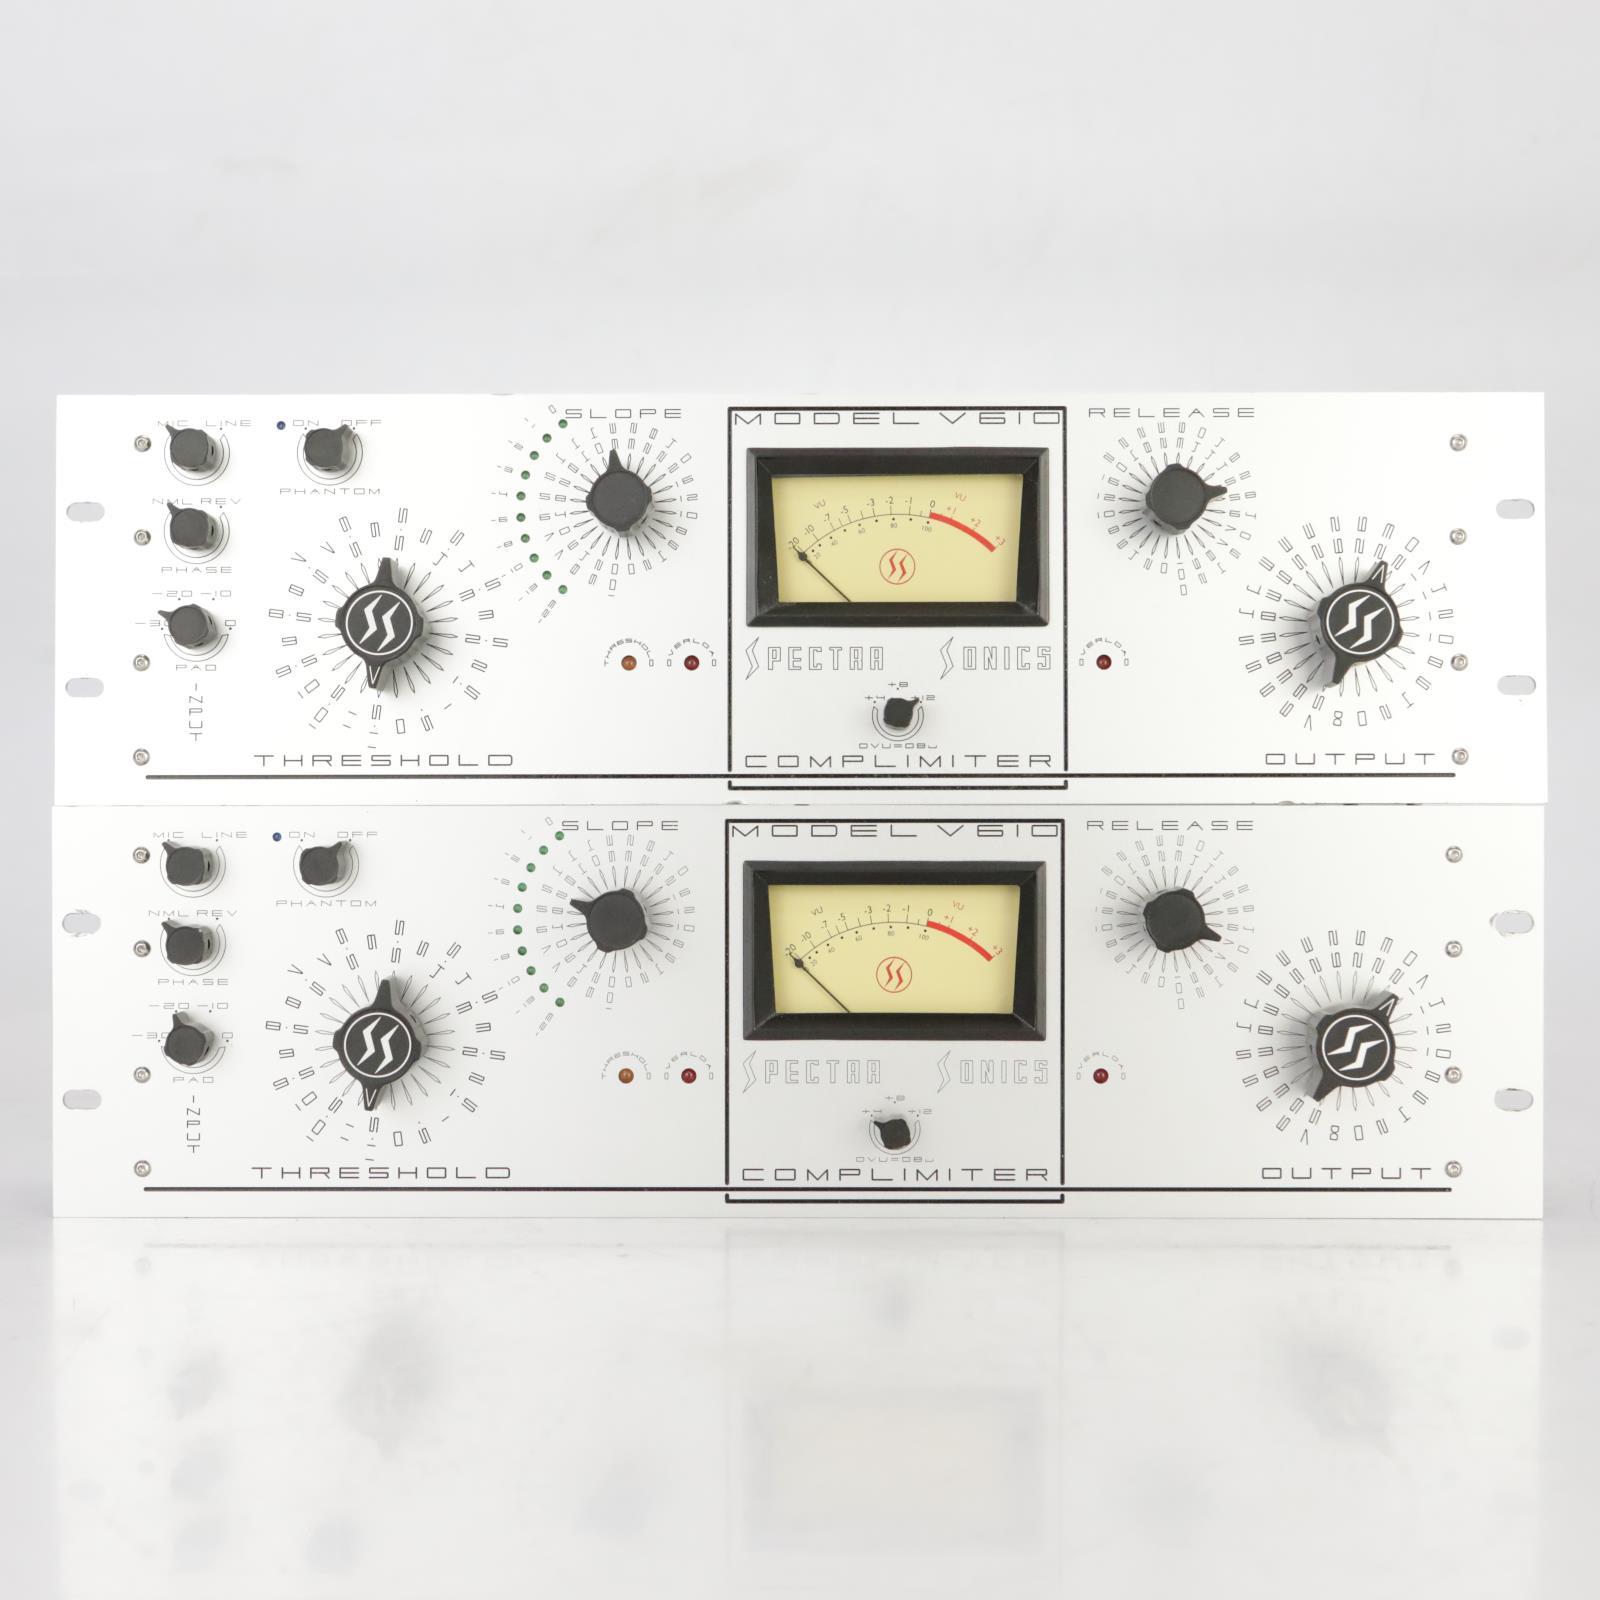 2 Spectra Sonics Complimiter Model V610 Compressor Limiter Pair #37862